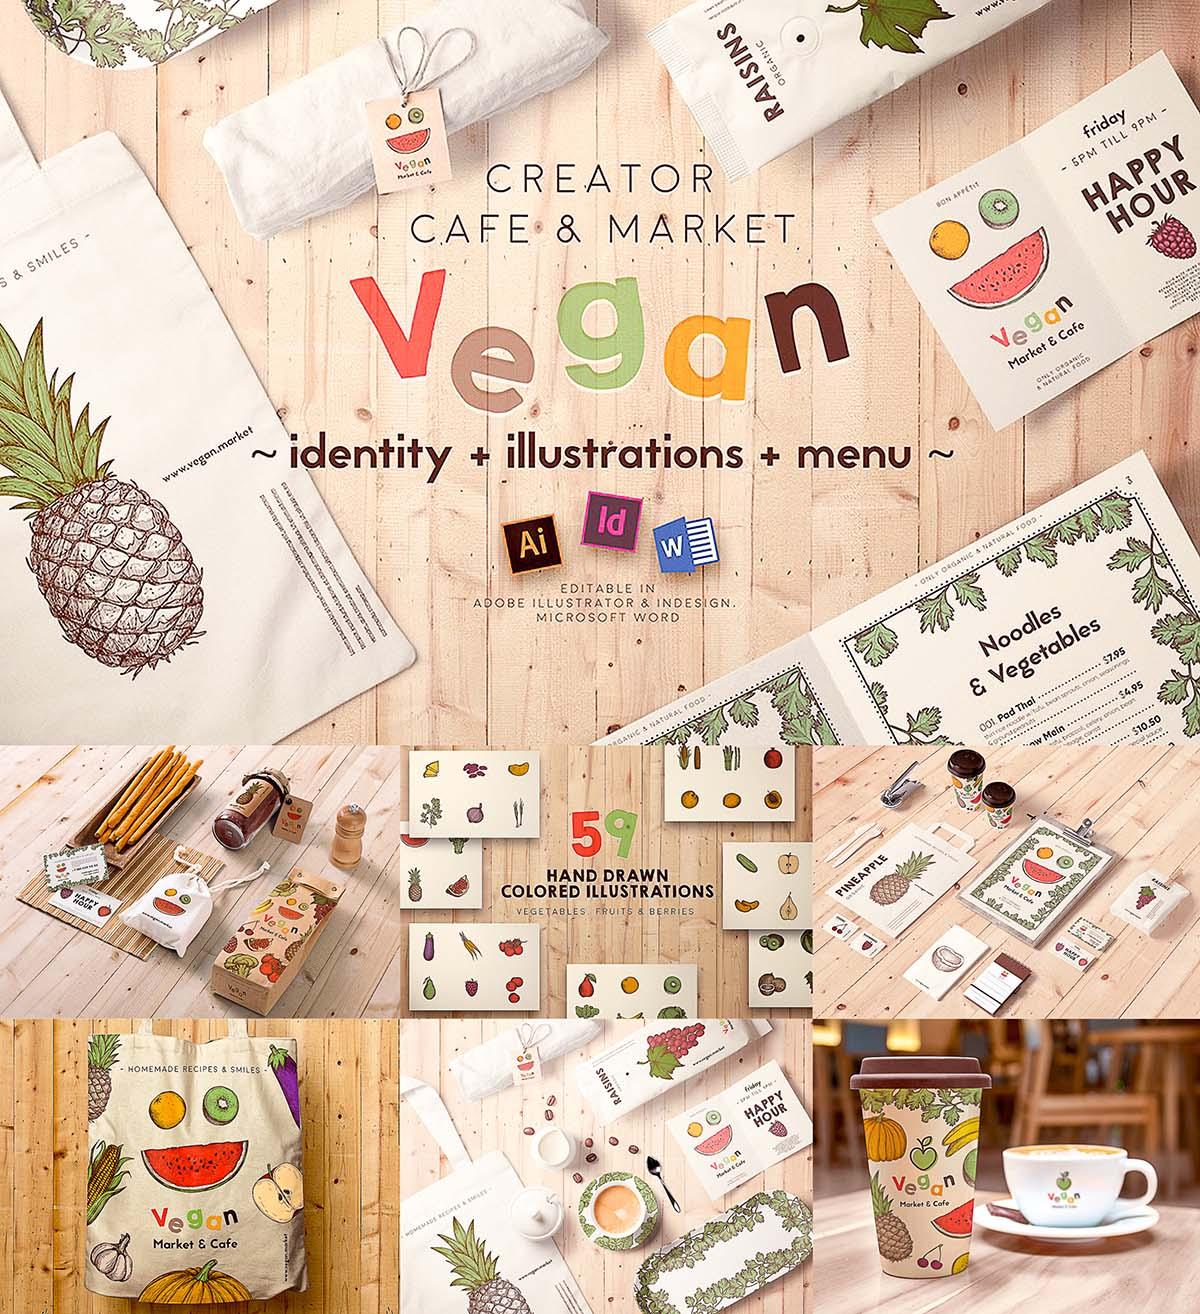 Vegan restaurant creator